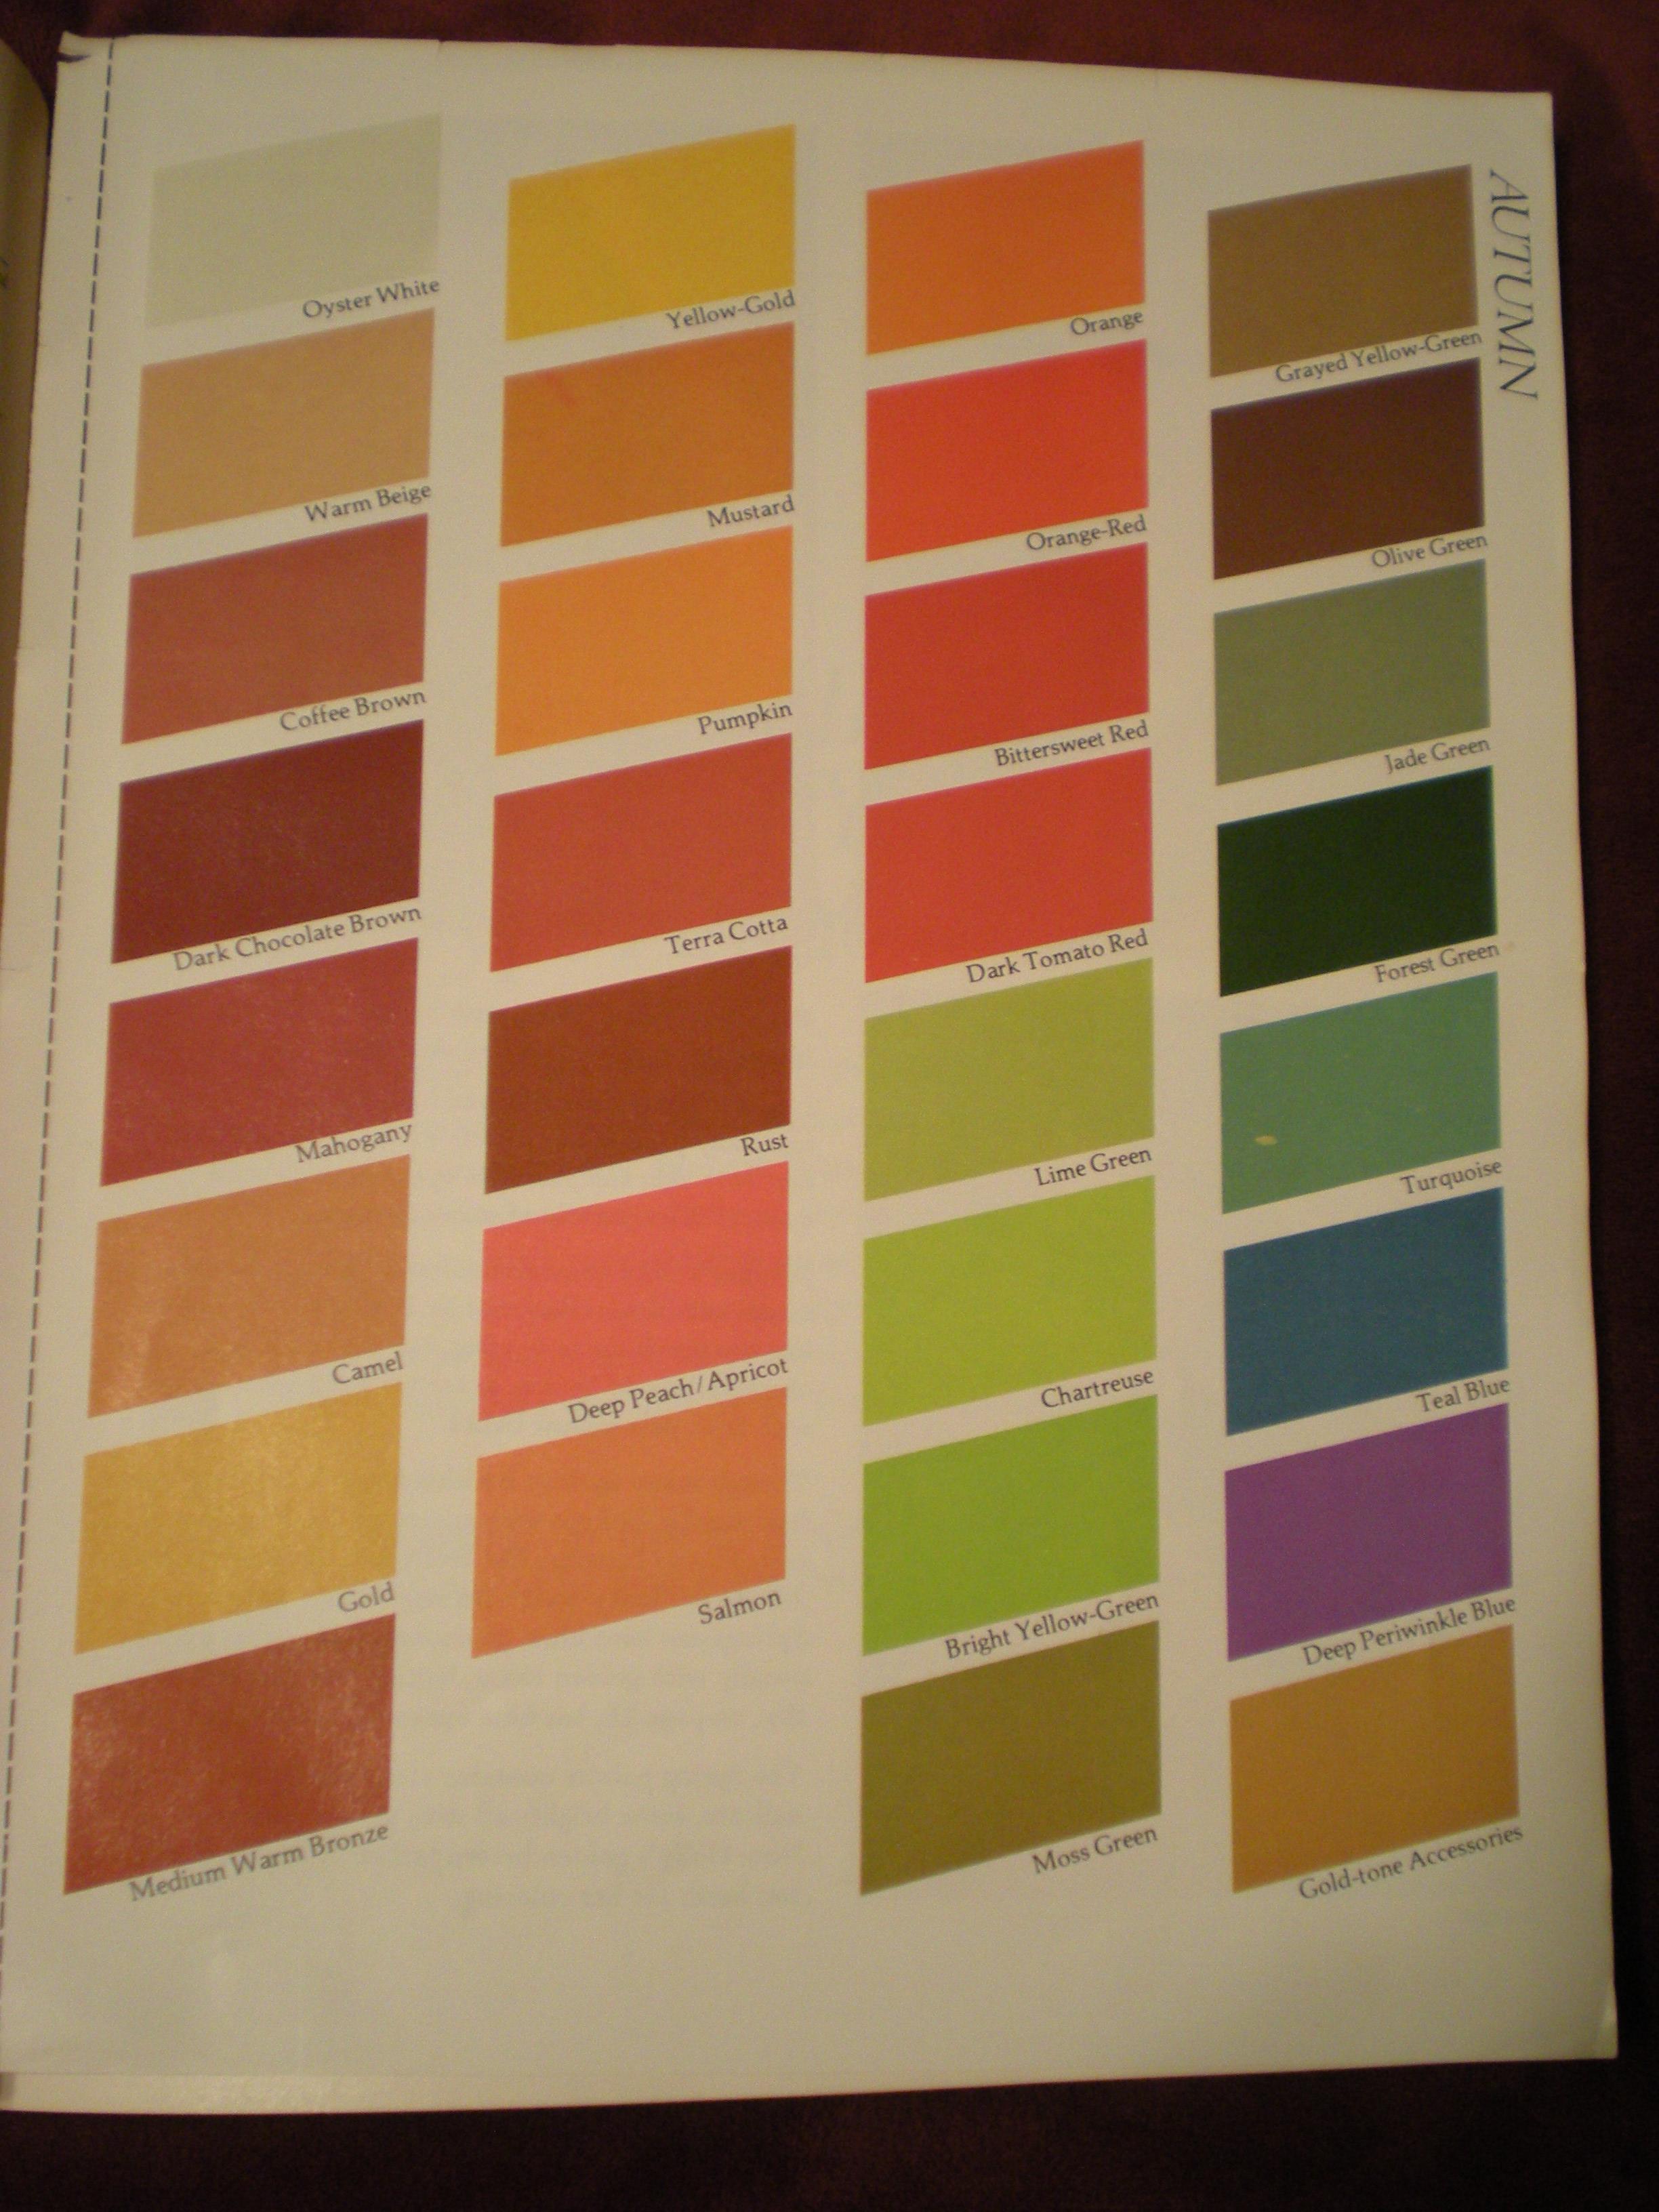 book color me beautiful : Autumn Colors Color Me Beautiful